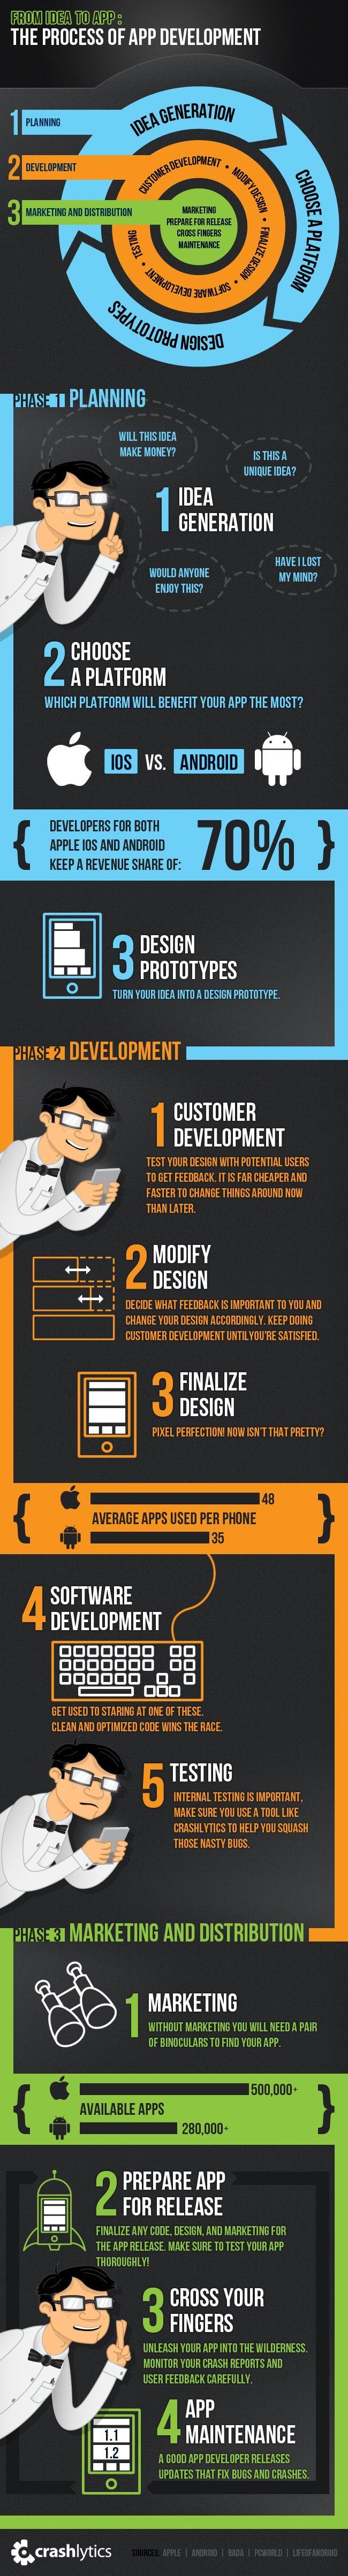 Crashlytics: From Idea To App  The Process Of App Development